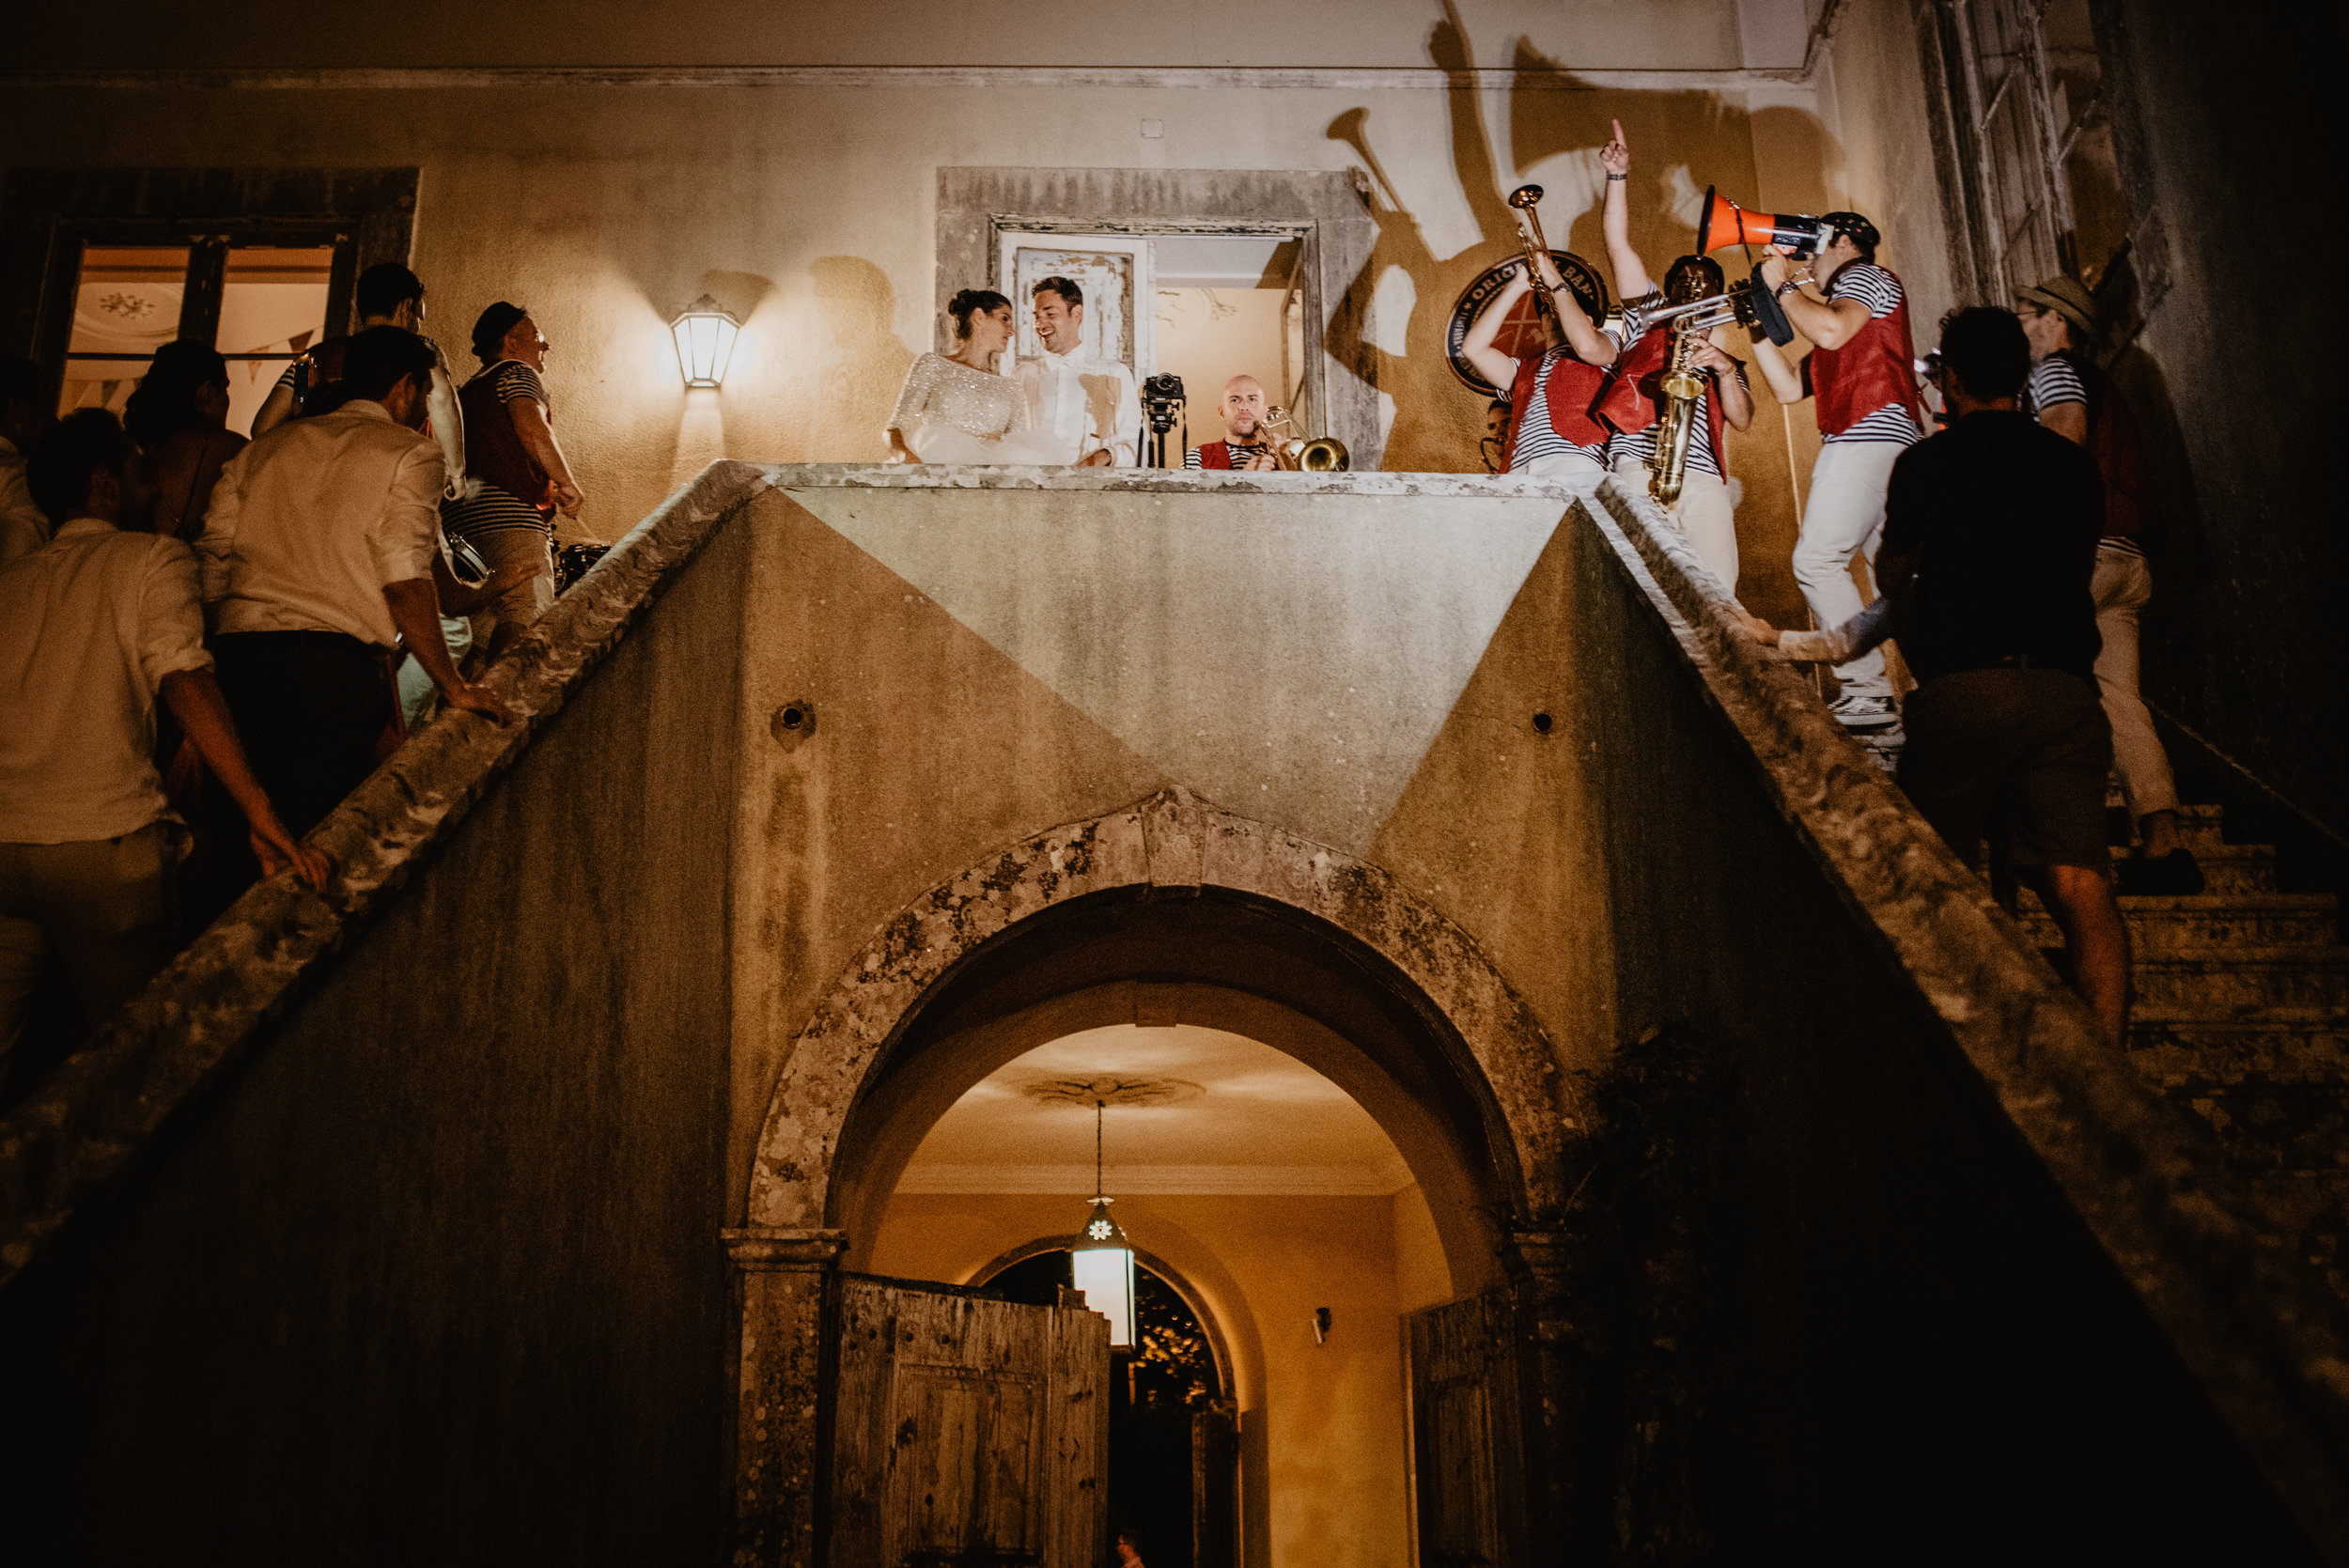 Lapela-photography-wedding-sintra-portugal-126.jpg